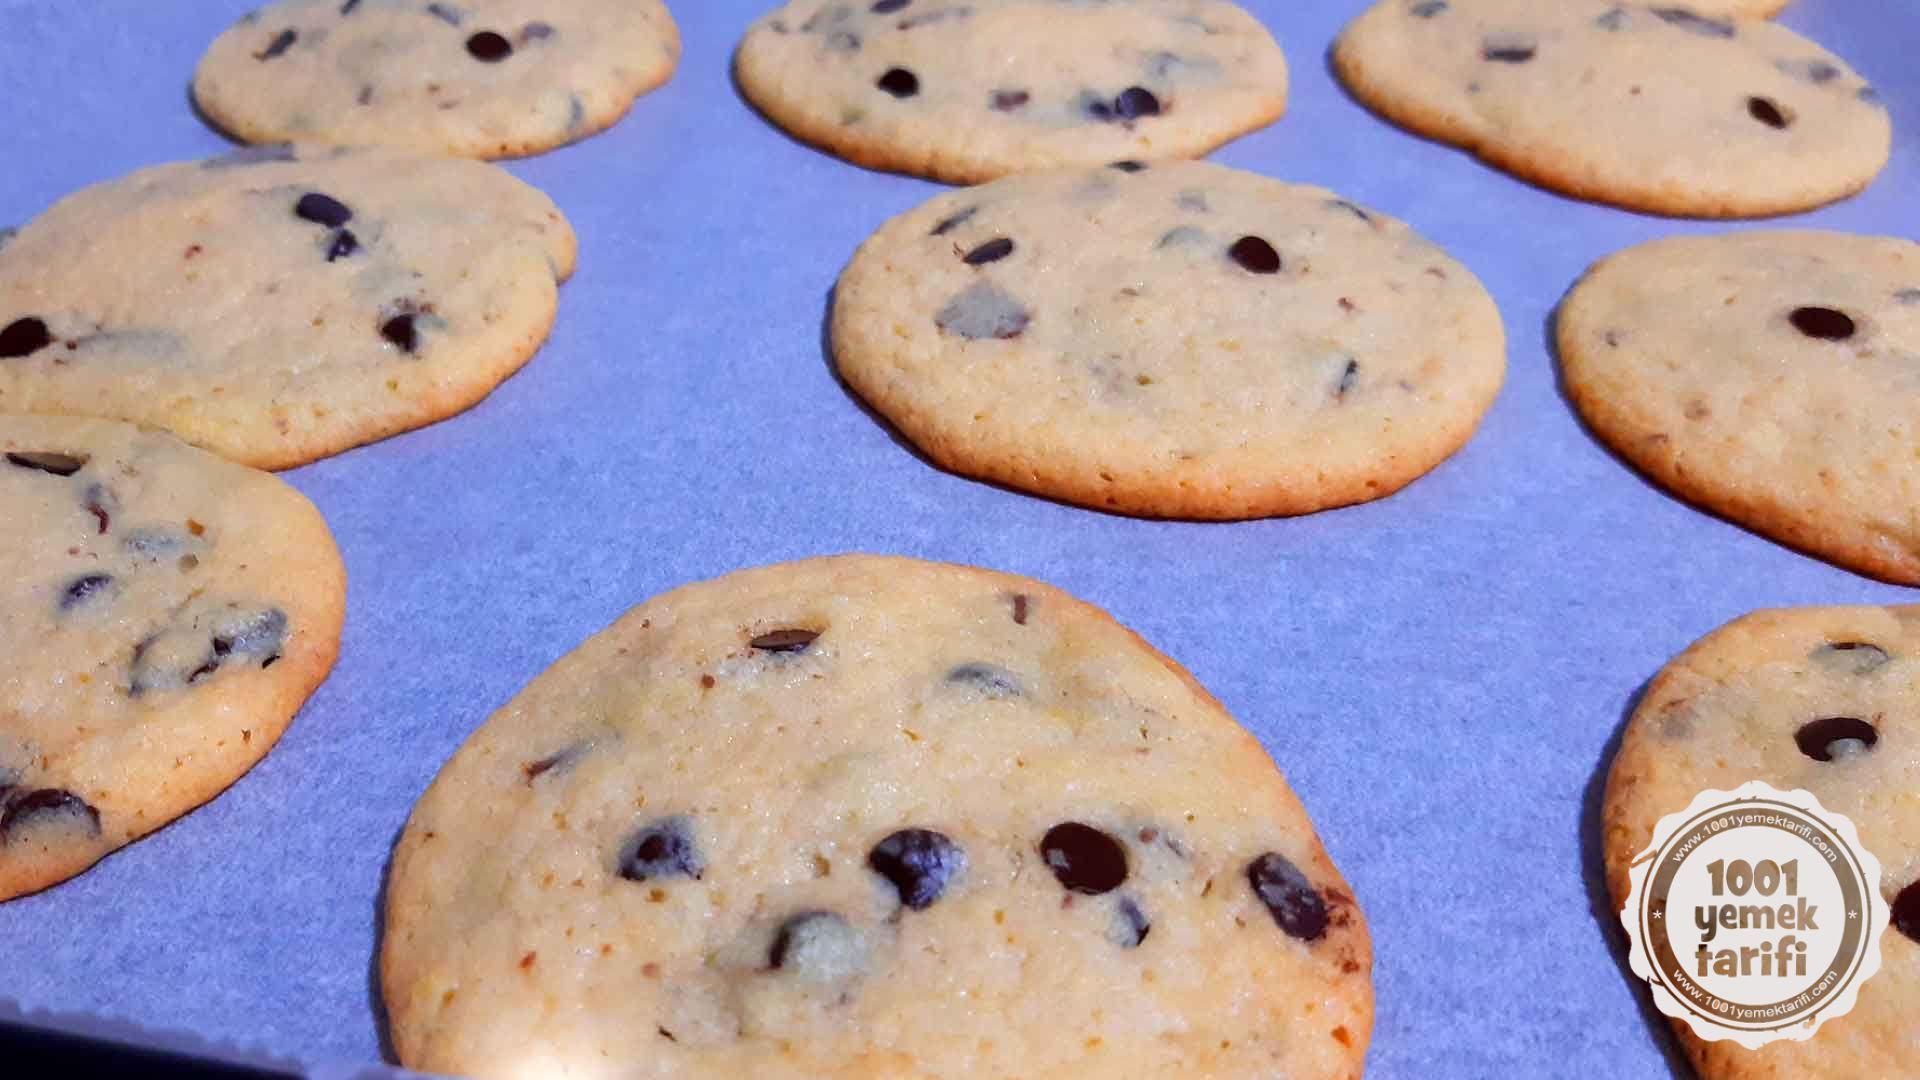 kurabiye tarifi-kolay kurabiye tarifleri-tatli kurabiye tarifi-1001yemektarifi